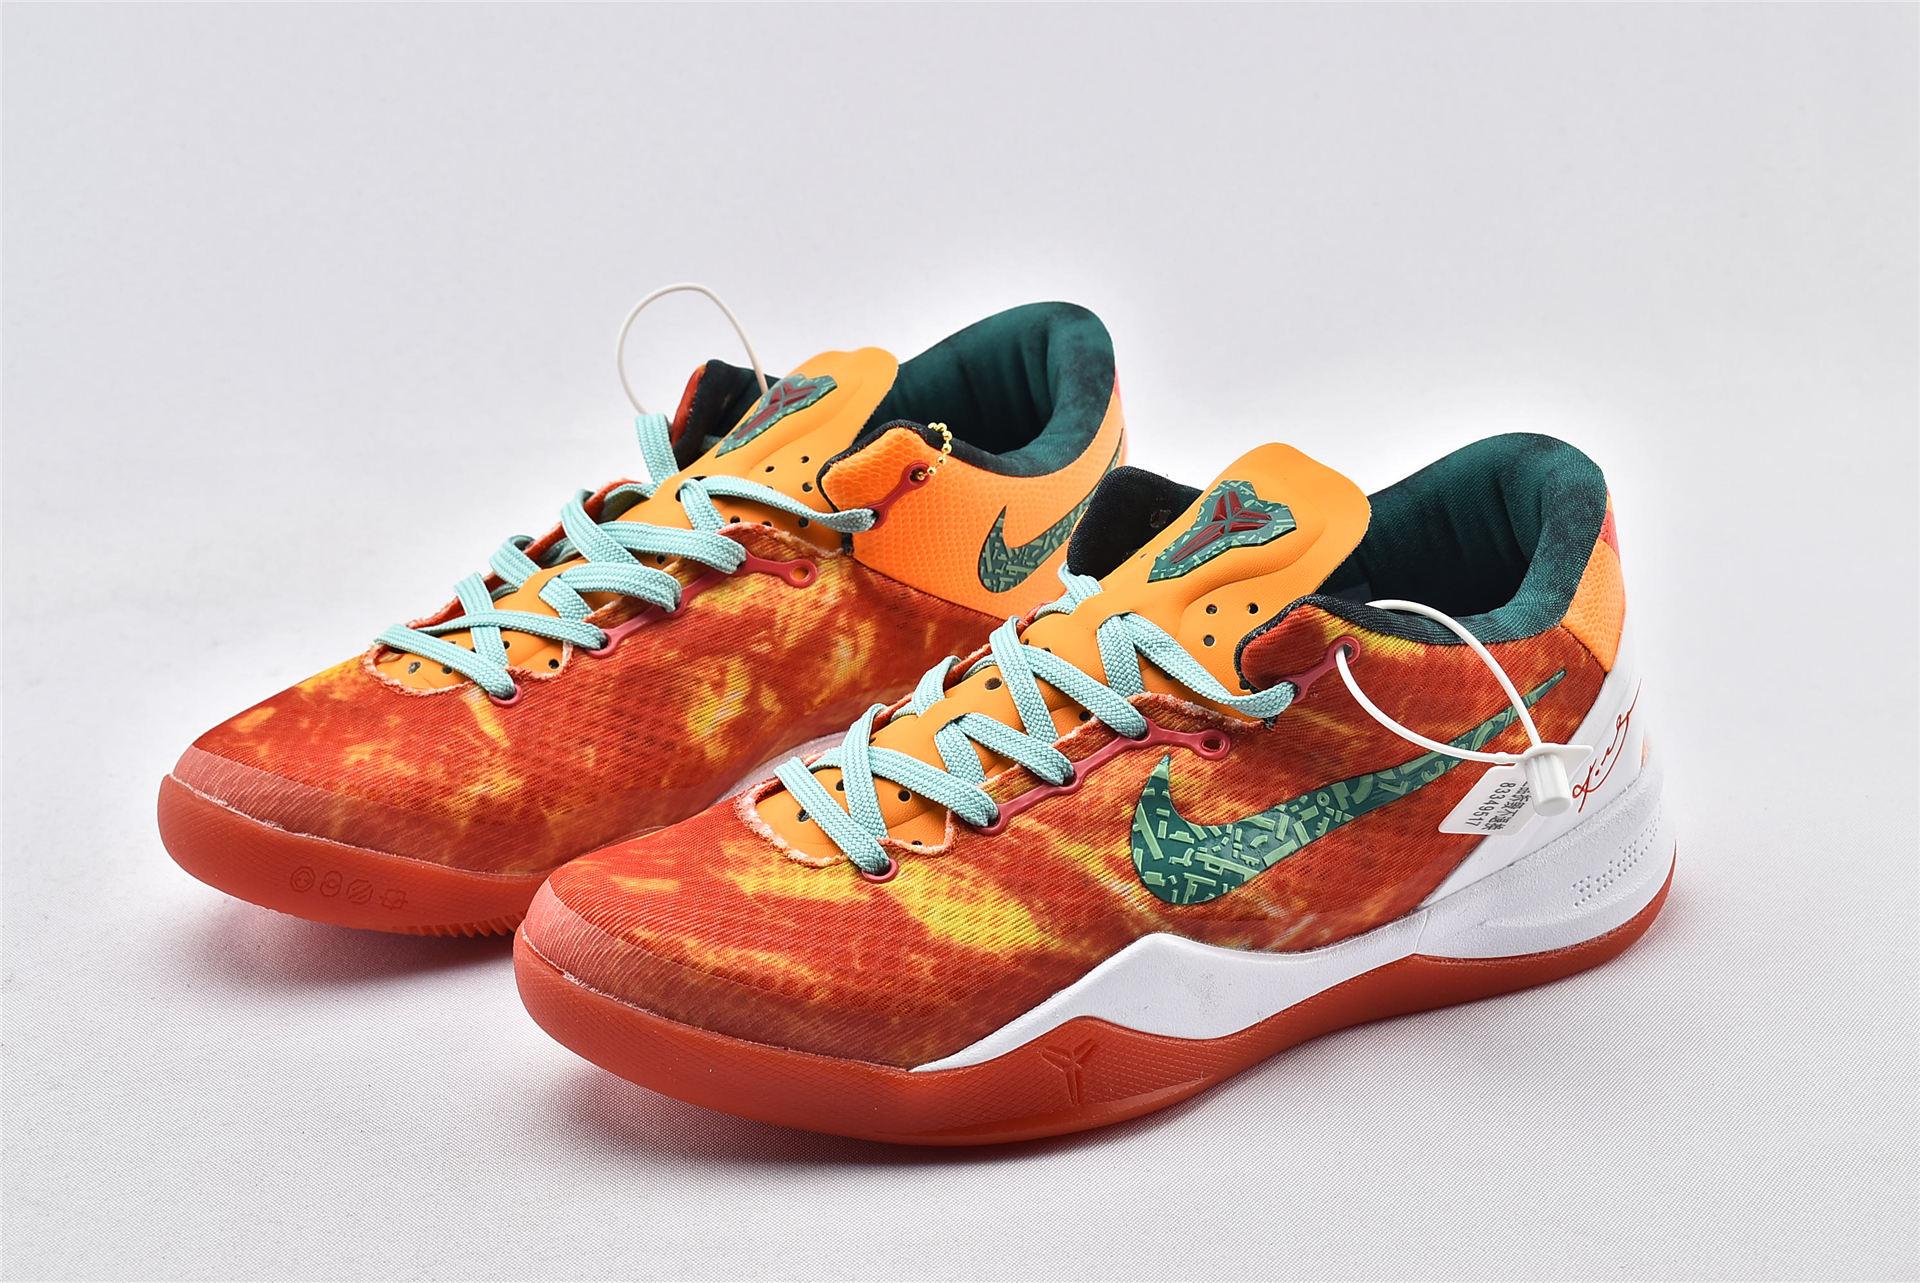 Zoom Kobe 8 科比8代篮球鞋/番茄蛋汤 白红黄   货号:587580-800  男鞋